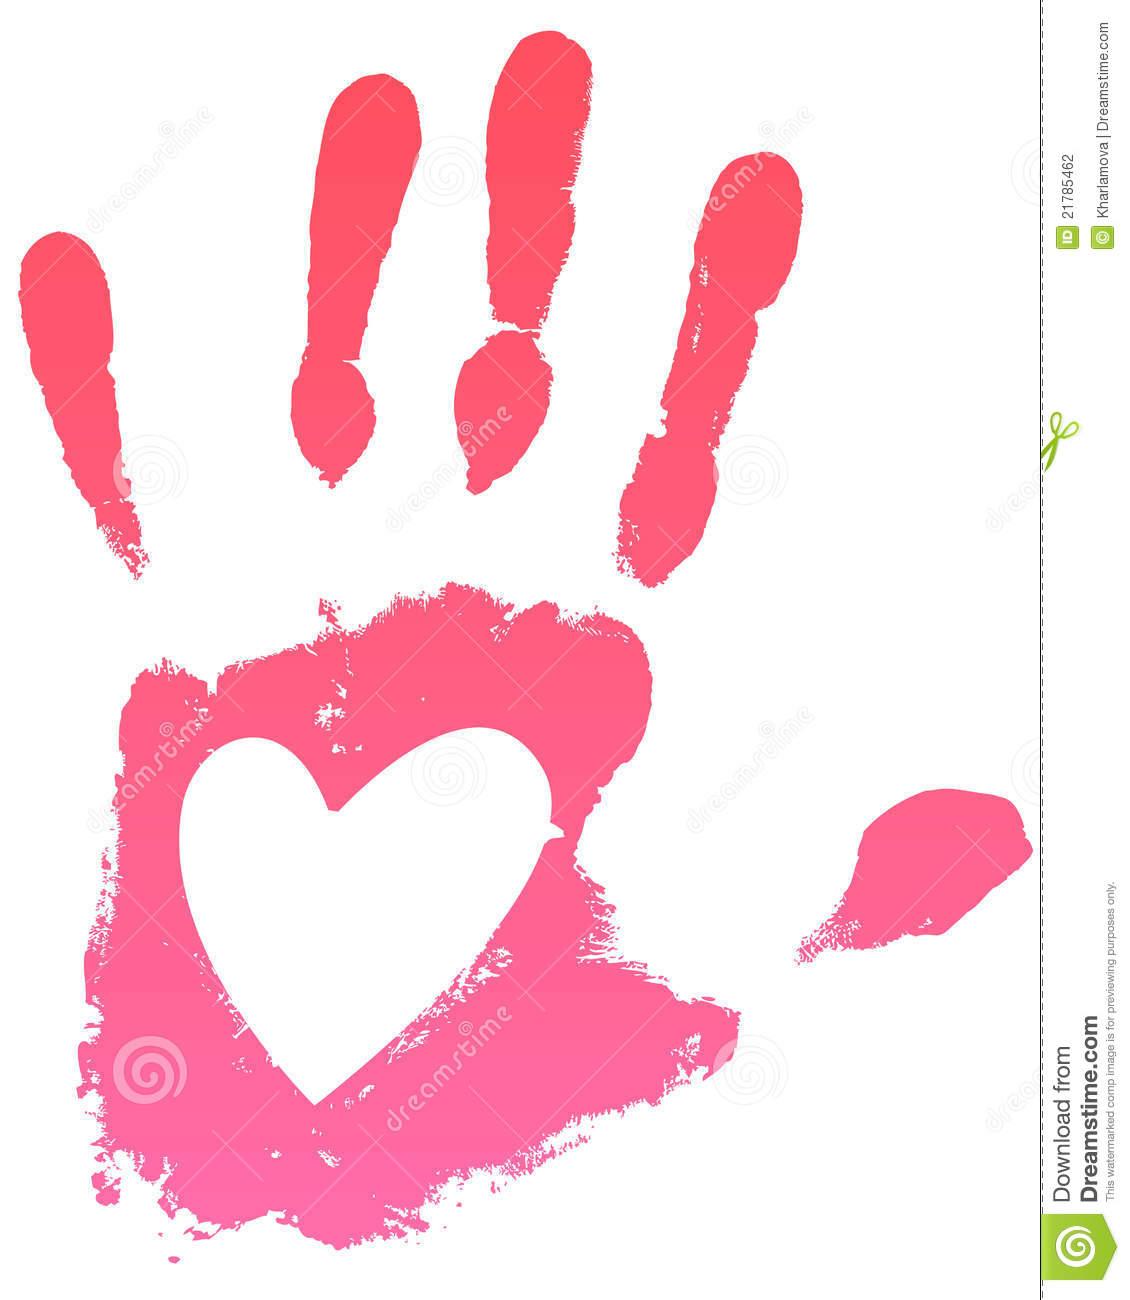 Handprint clipart pink  india Clipart & Handprint